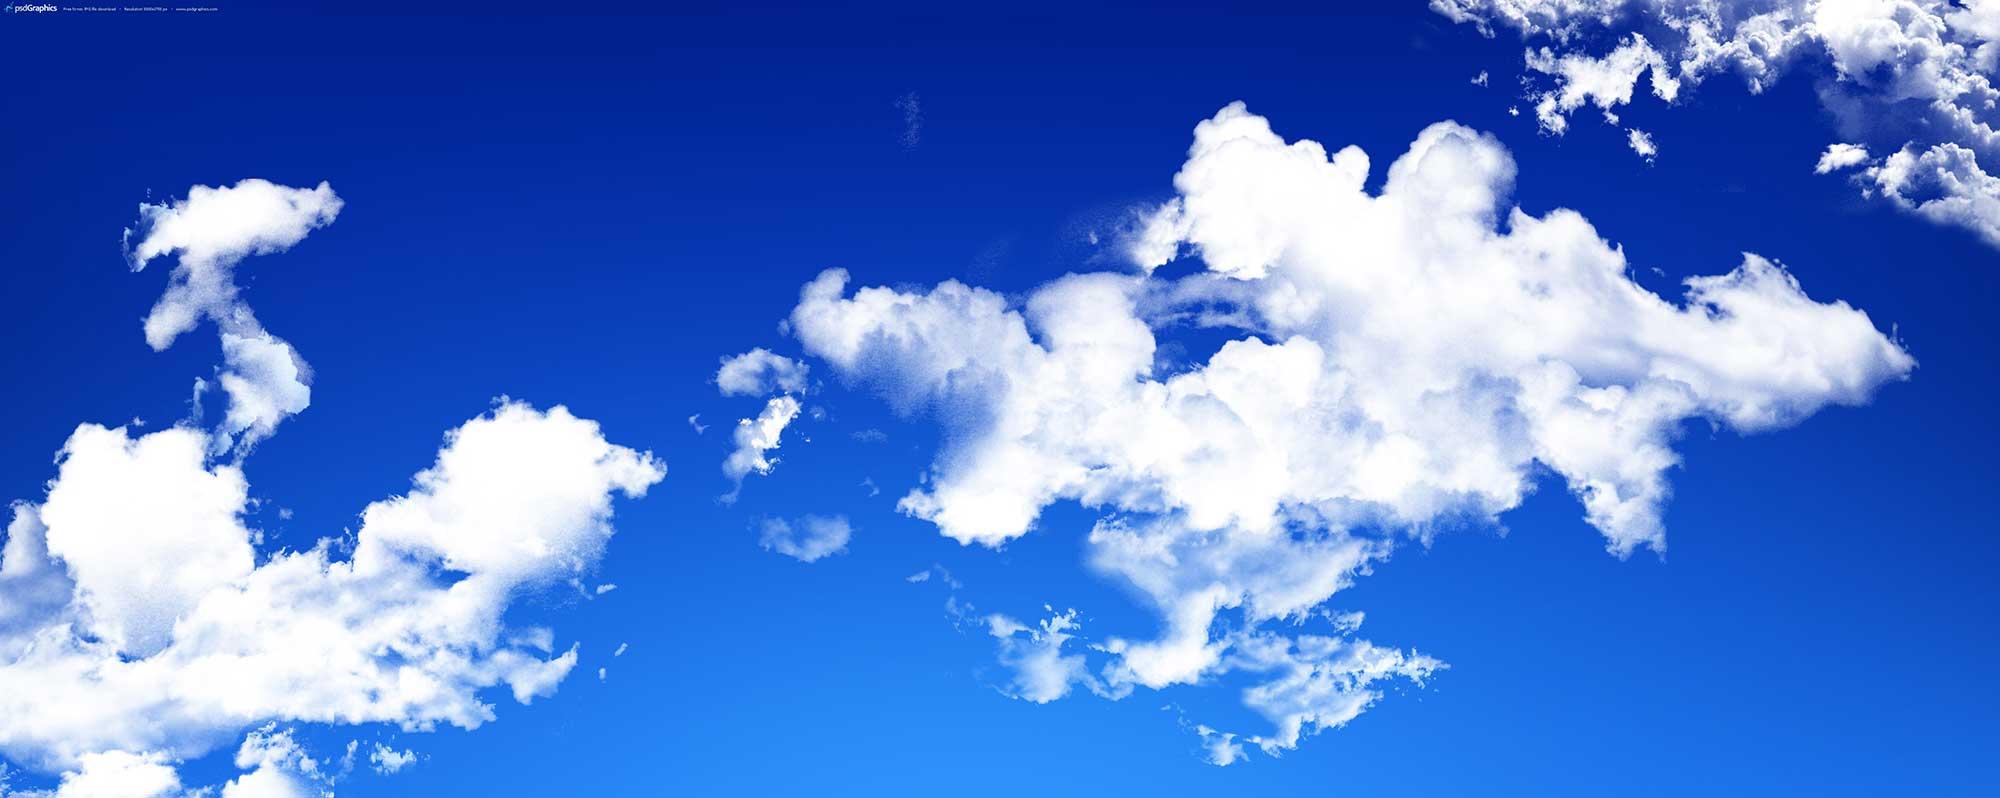 a-cloud-background